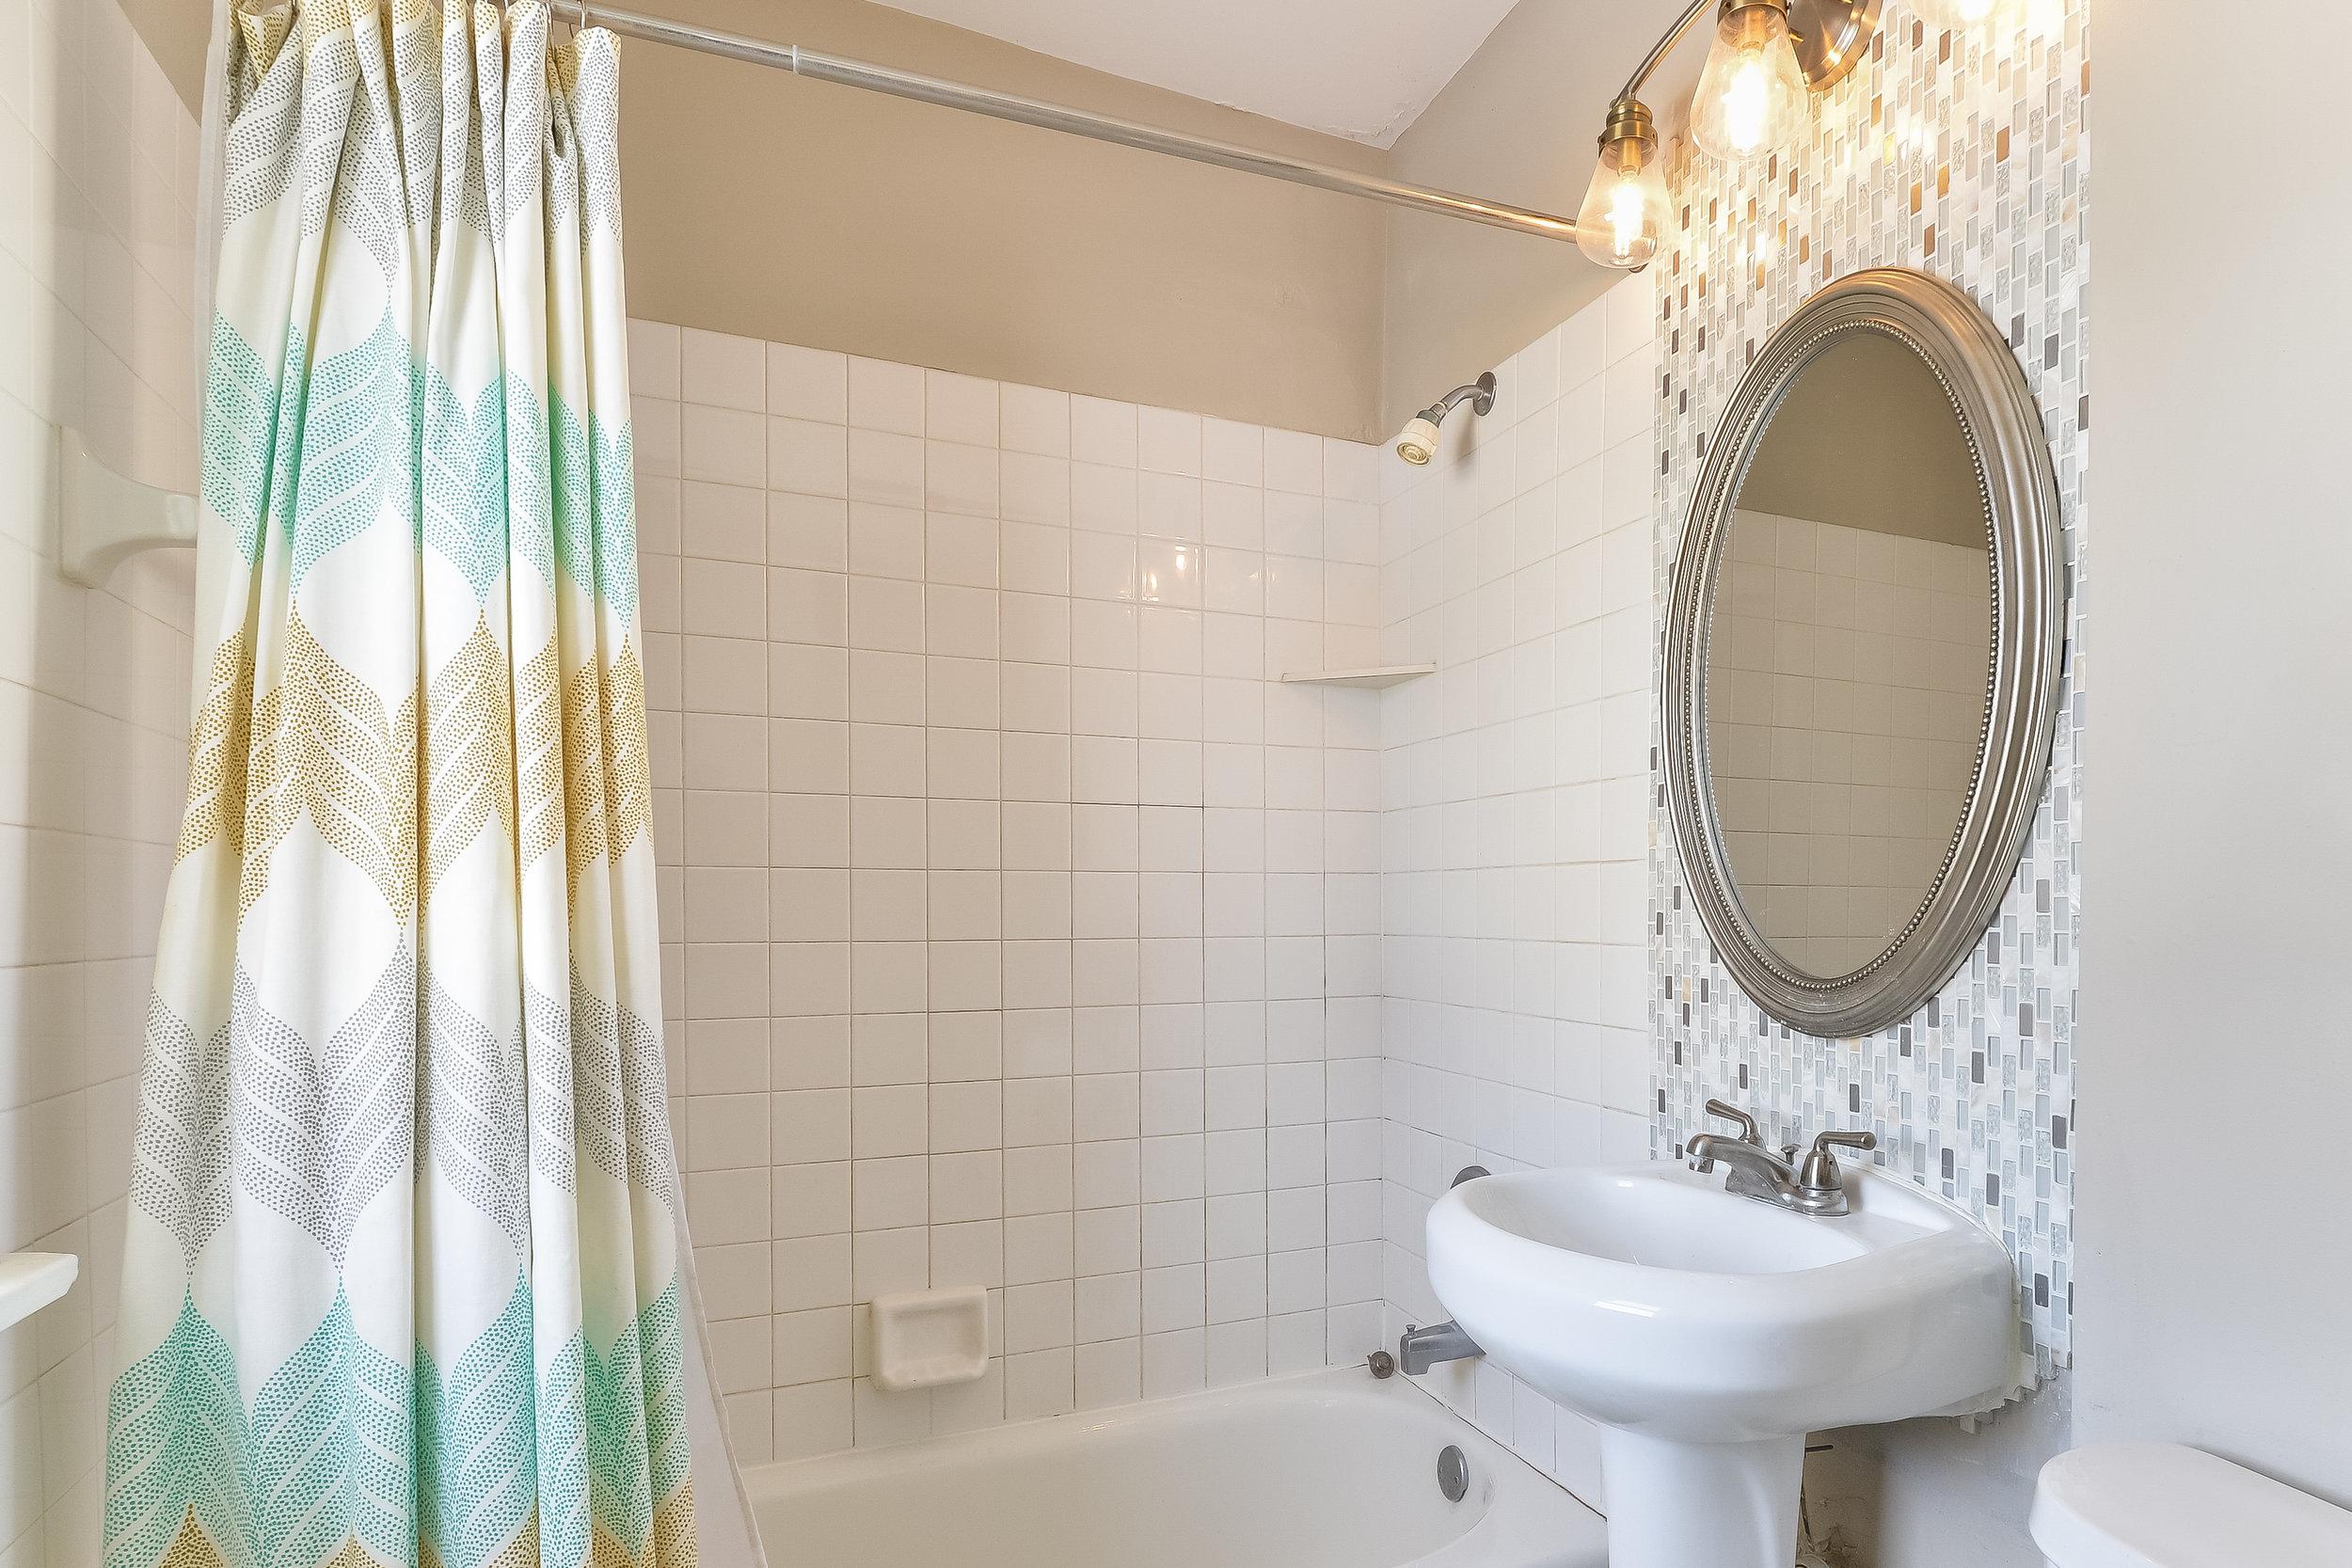 020-Bathroom-5454049-large.jpg